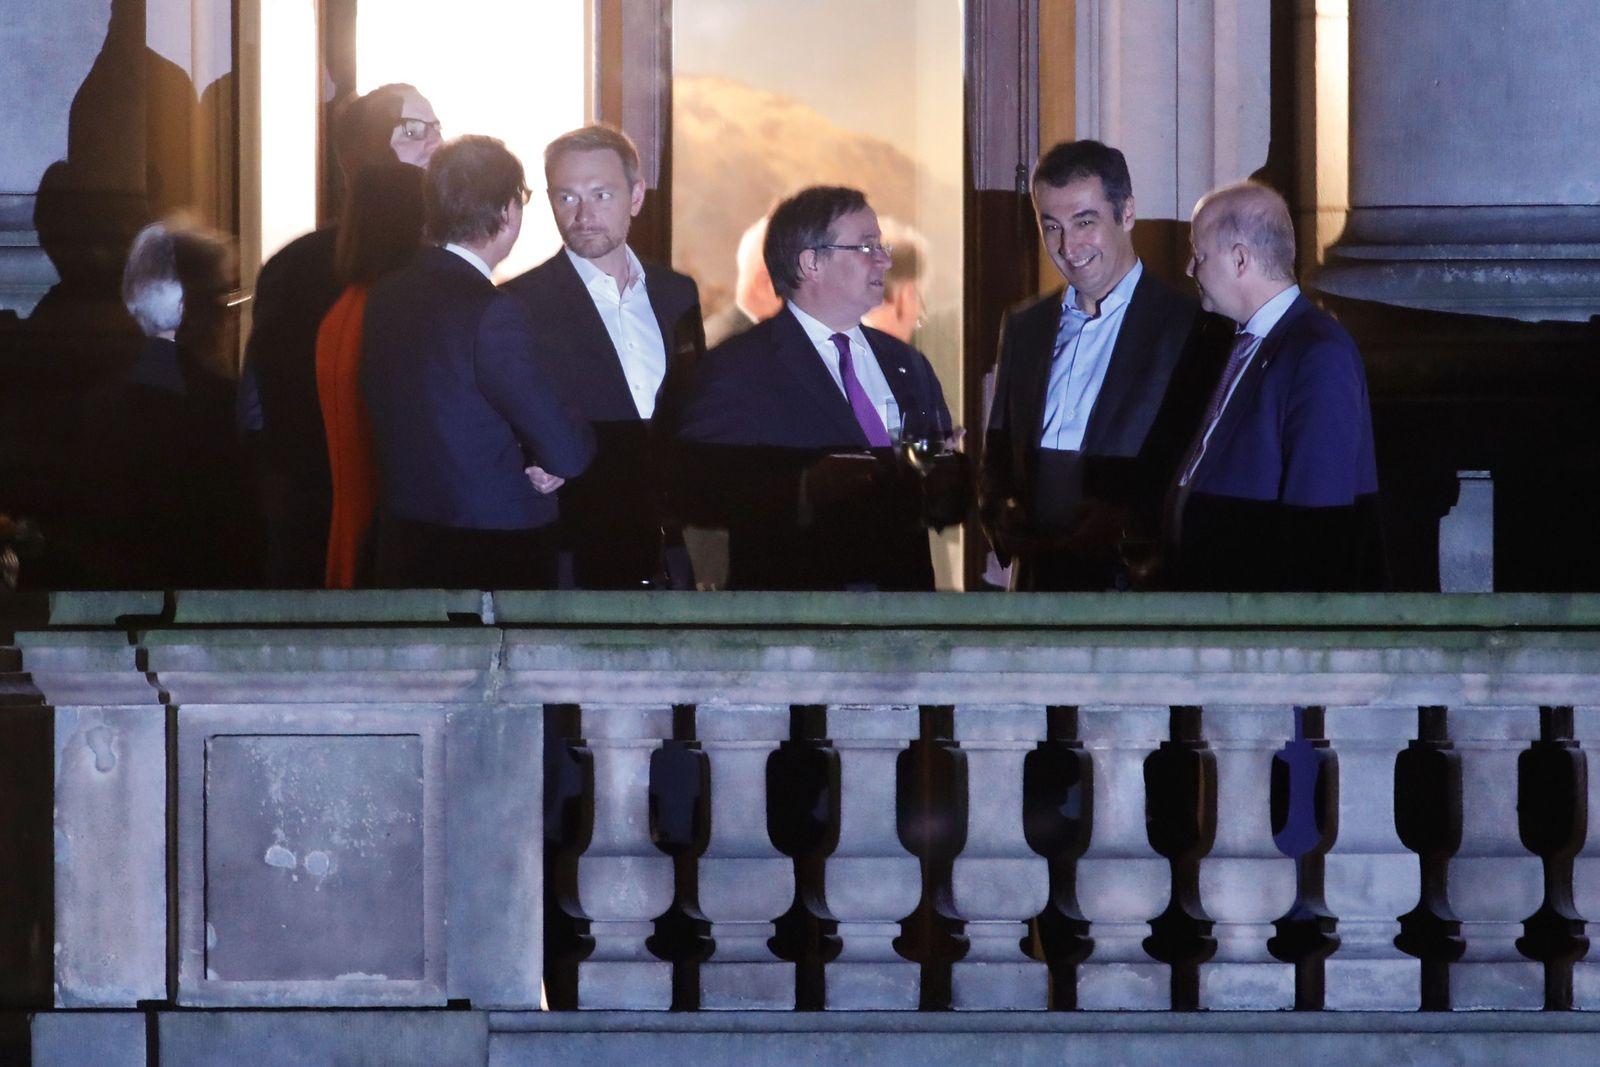 GERMANY-POLITICS-PARTIES-COALITION-TALKS